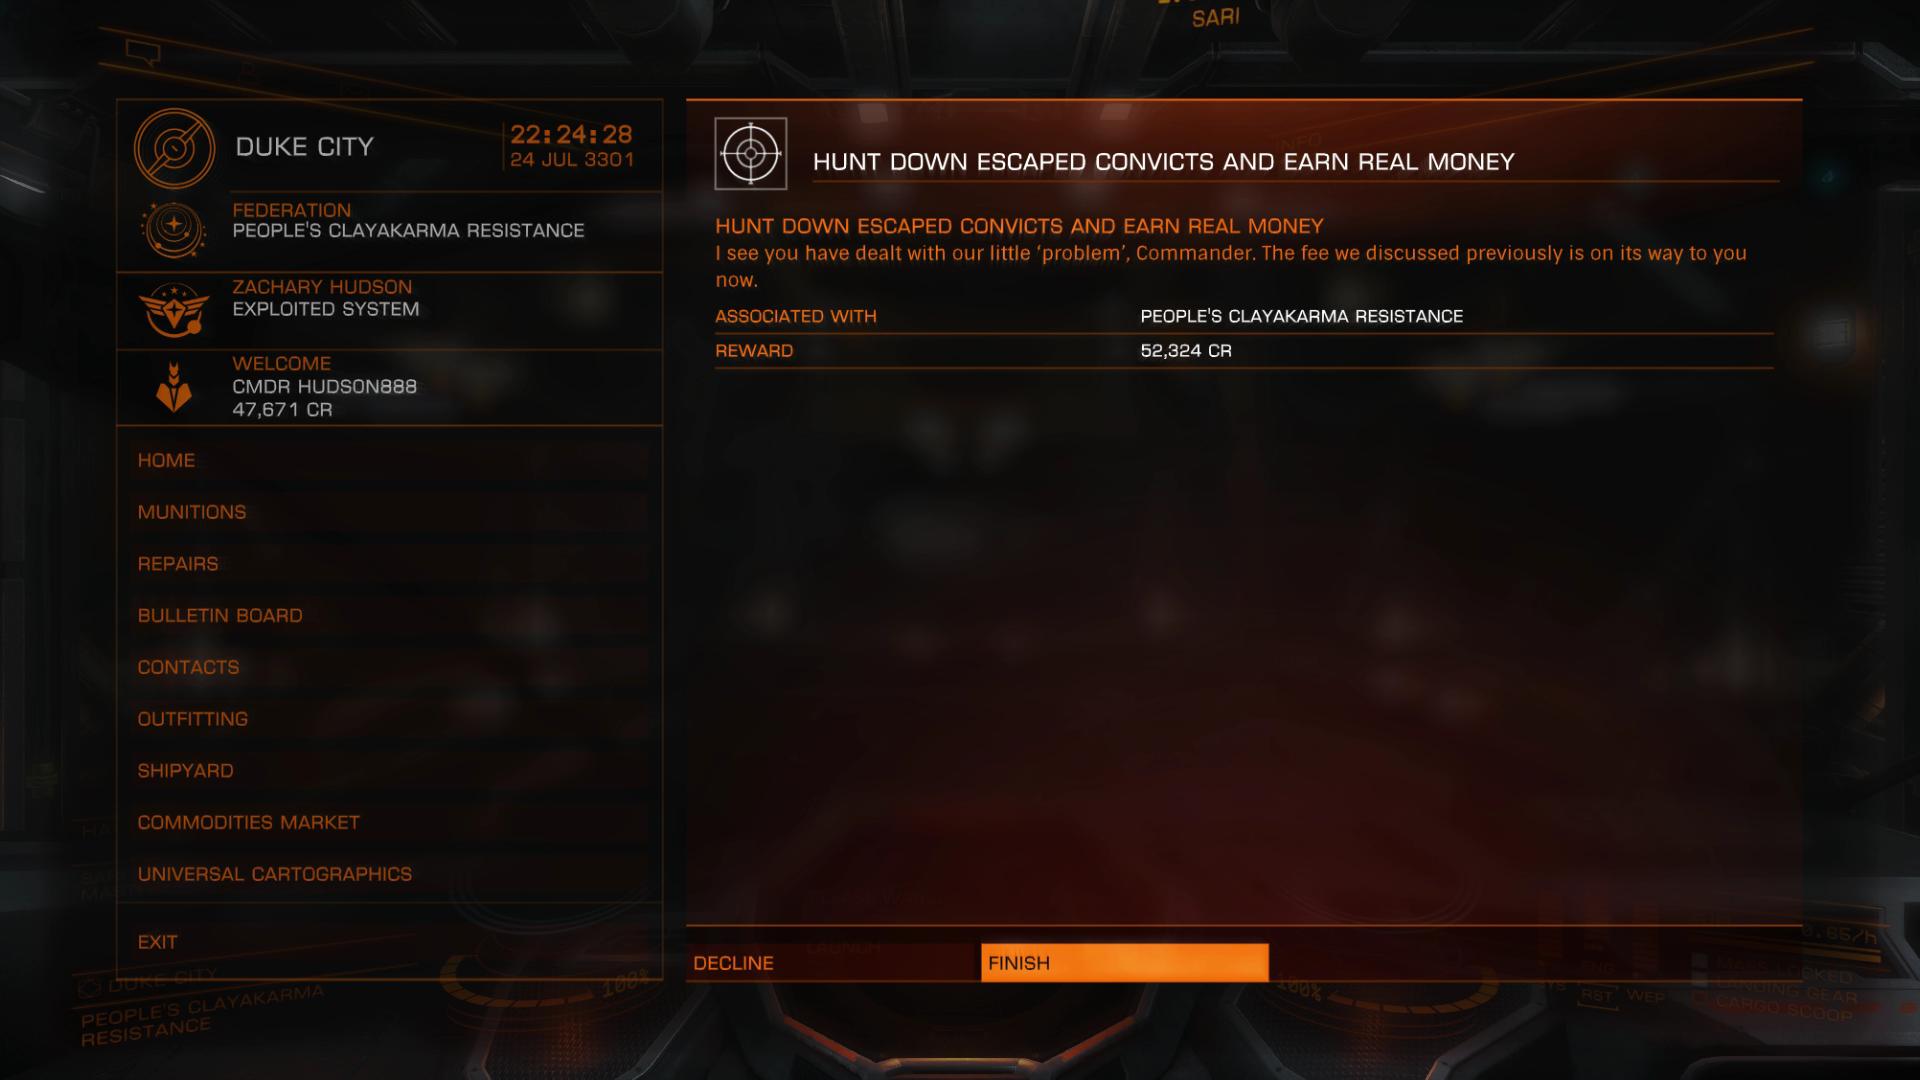 Elite Dangerous Screenshot 2015-07-24 23-24-29